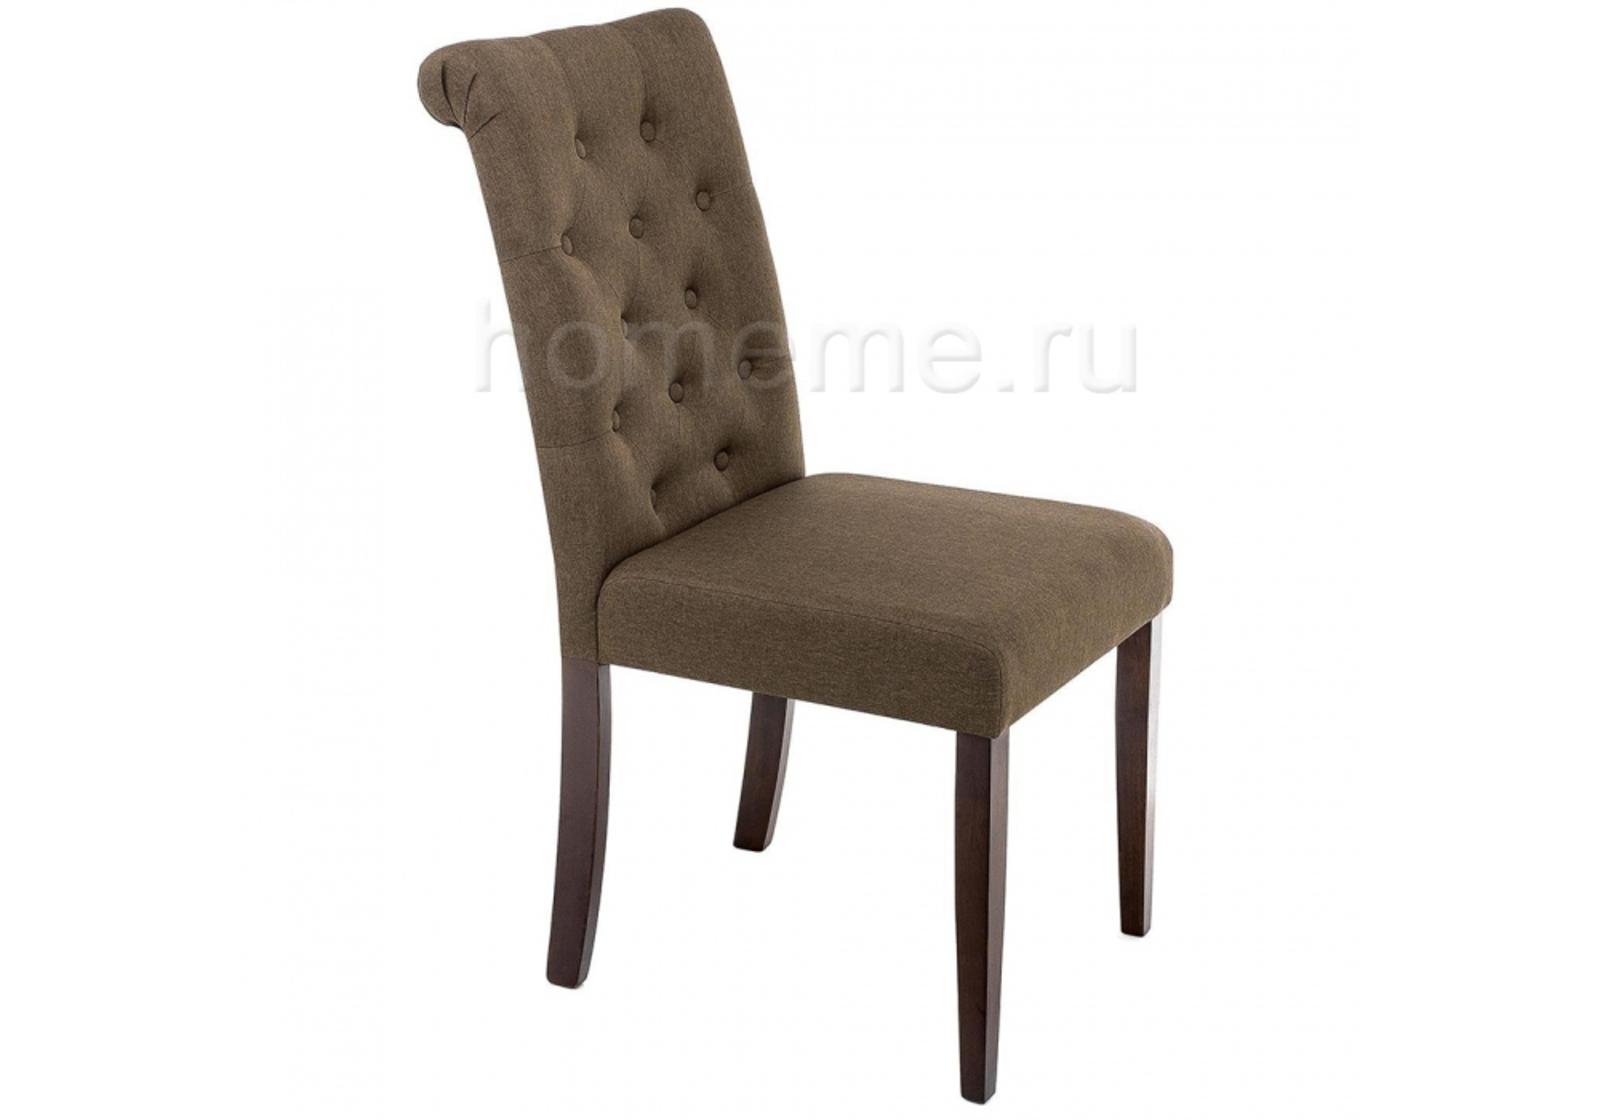 Стул HomeMe Amelia dark walnut / fabric brown 11018 от Homeme.ru